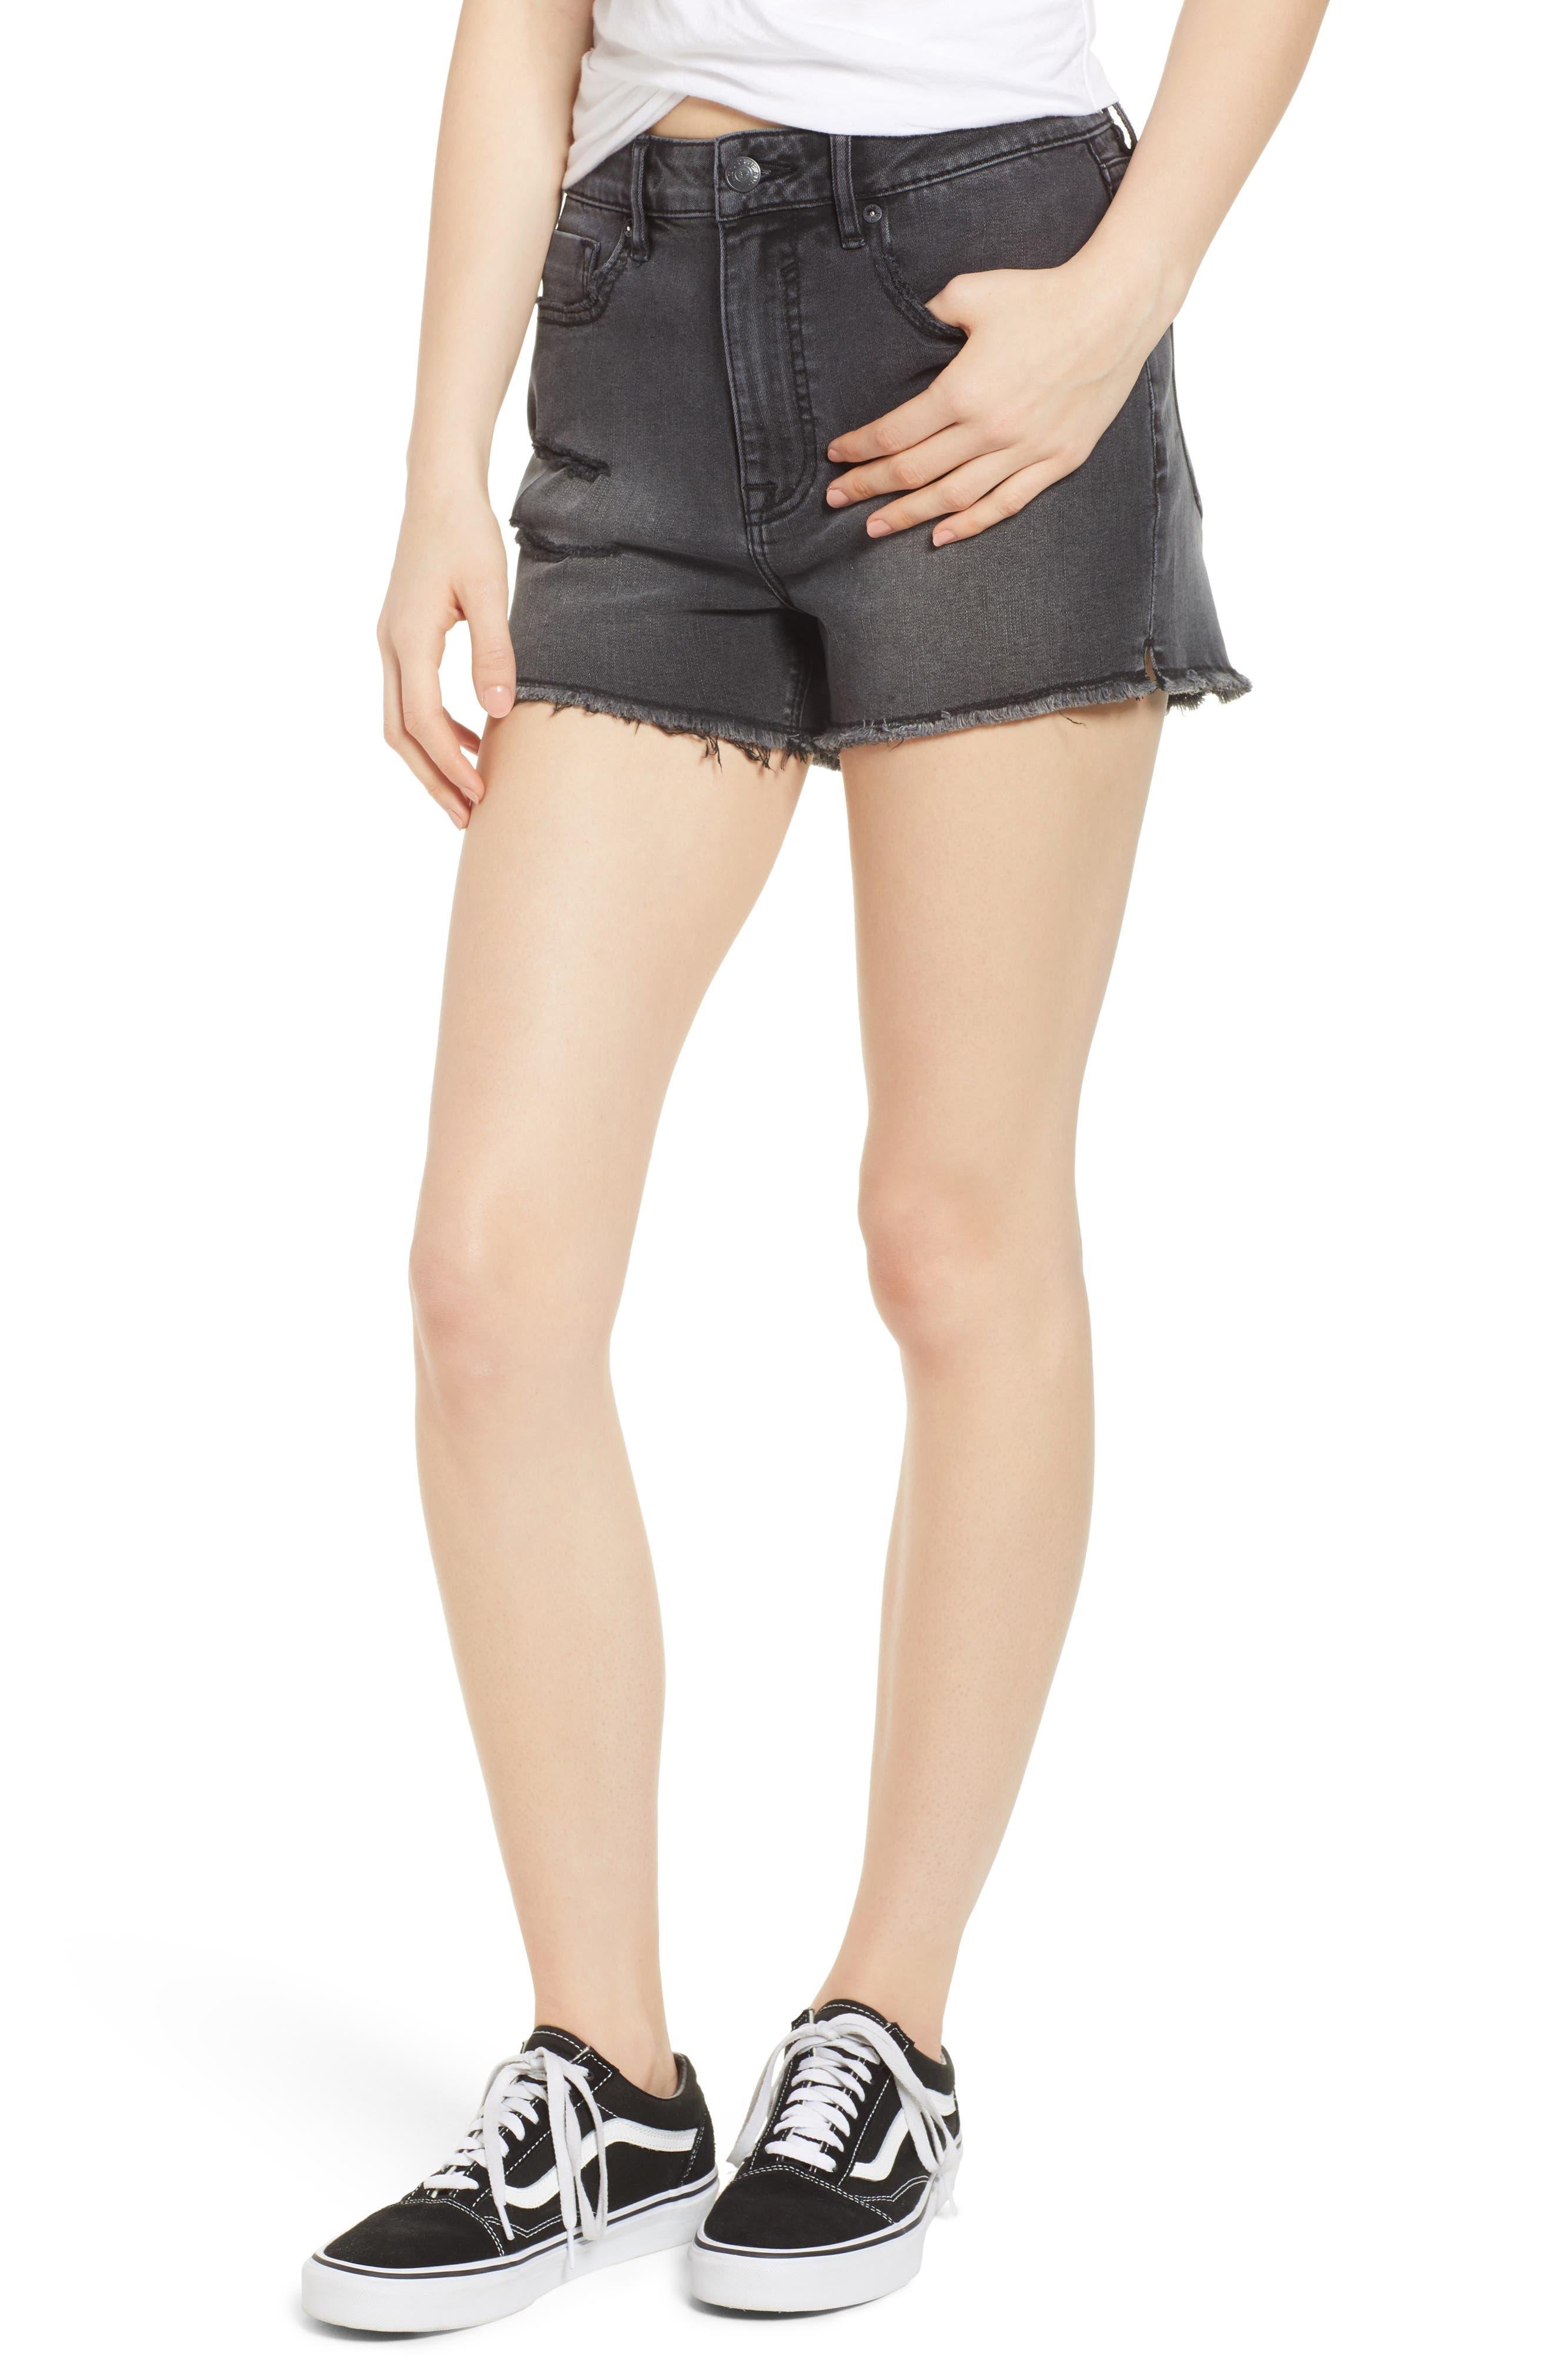 Alternate Image 1 Selected - Vigoss Jagger High Waist Denim Shorts